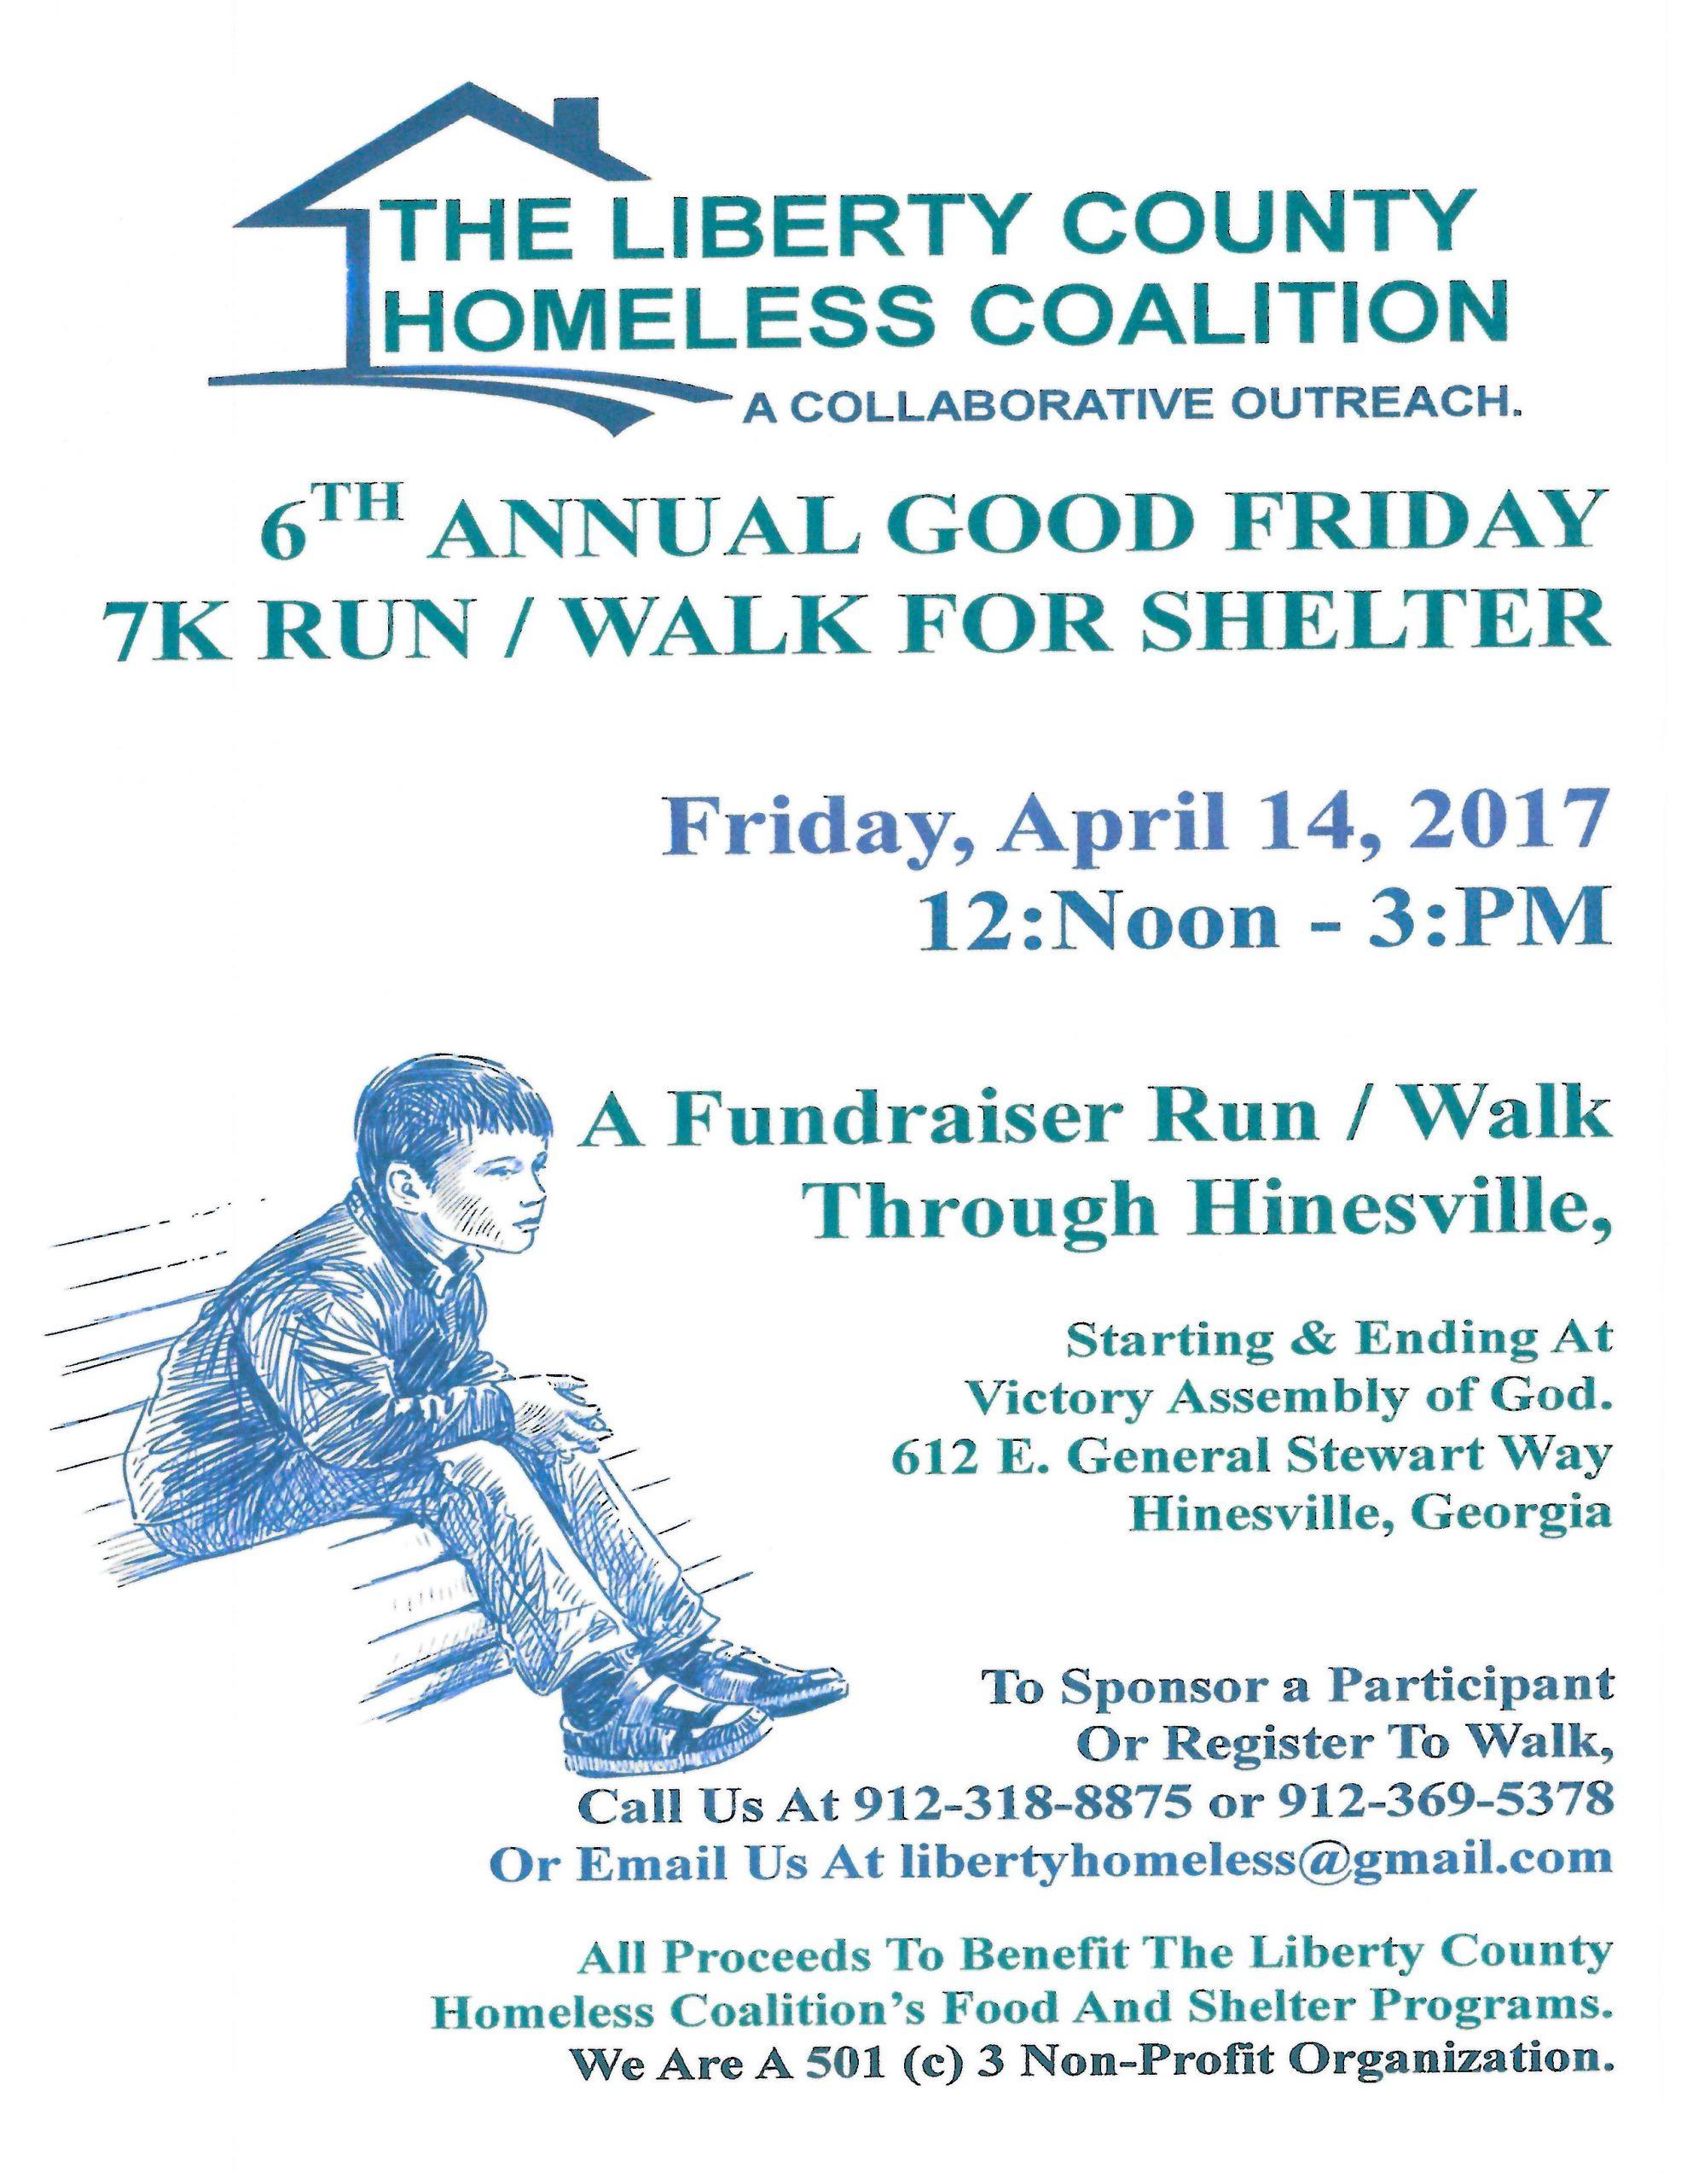 LCHC 6th Annual Good Friday 7K Run/Walk for Shelter